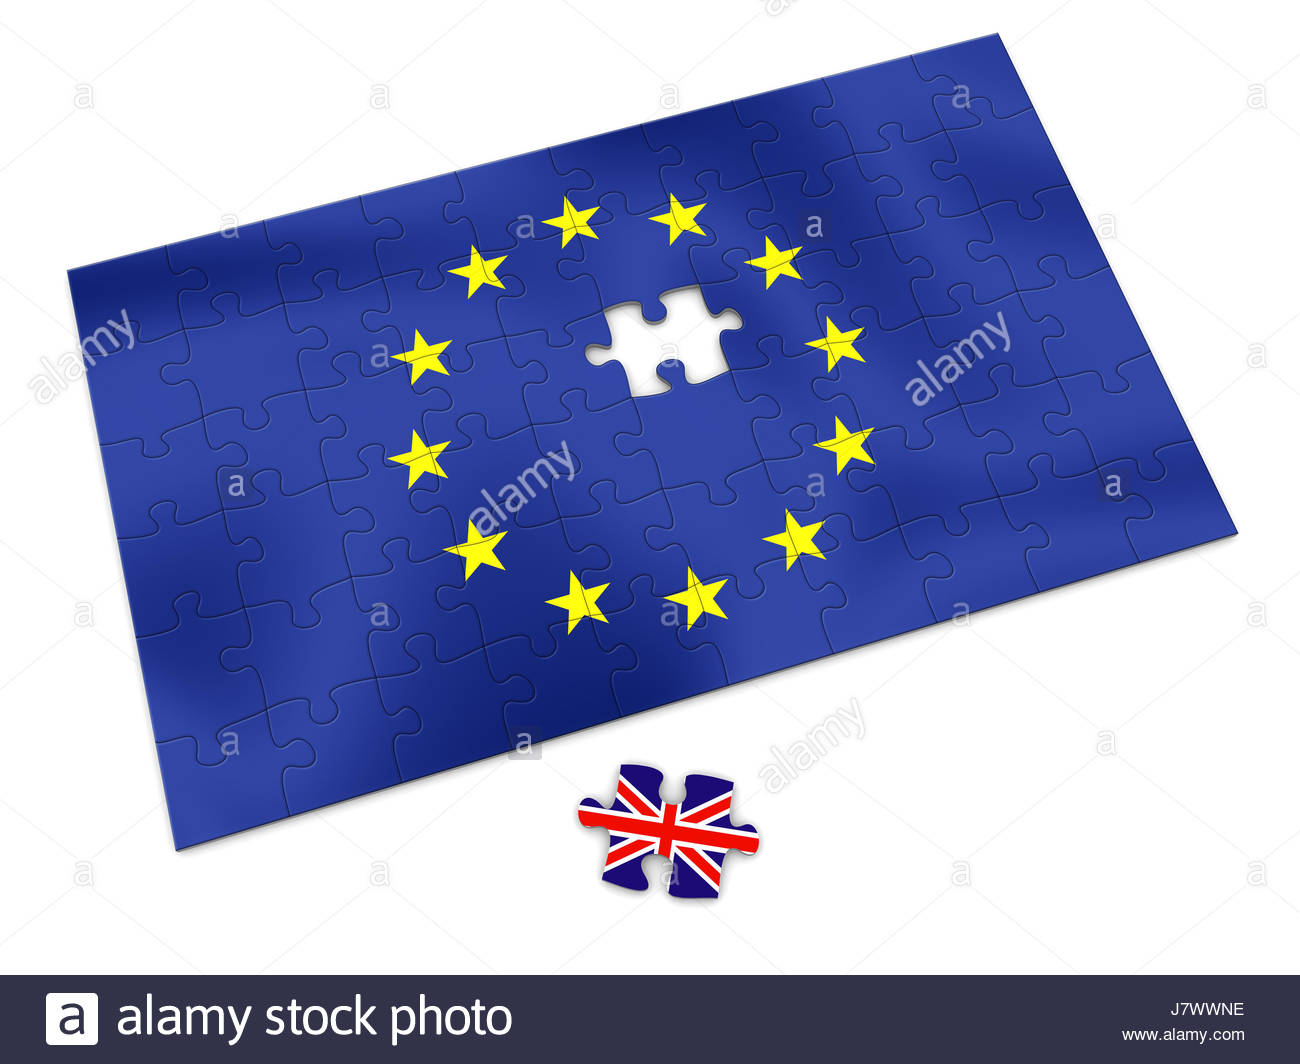 blank european caucasian europe england union jigsaw puzzle jigsaw puzzle - Stock Image